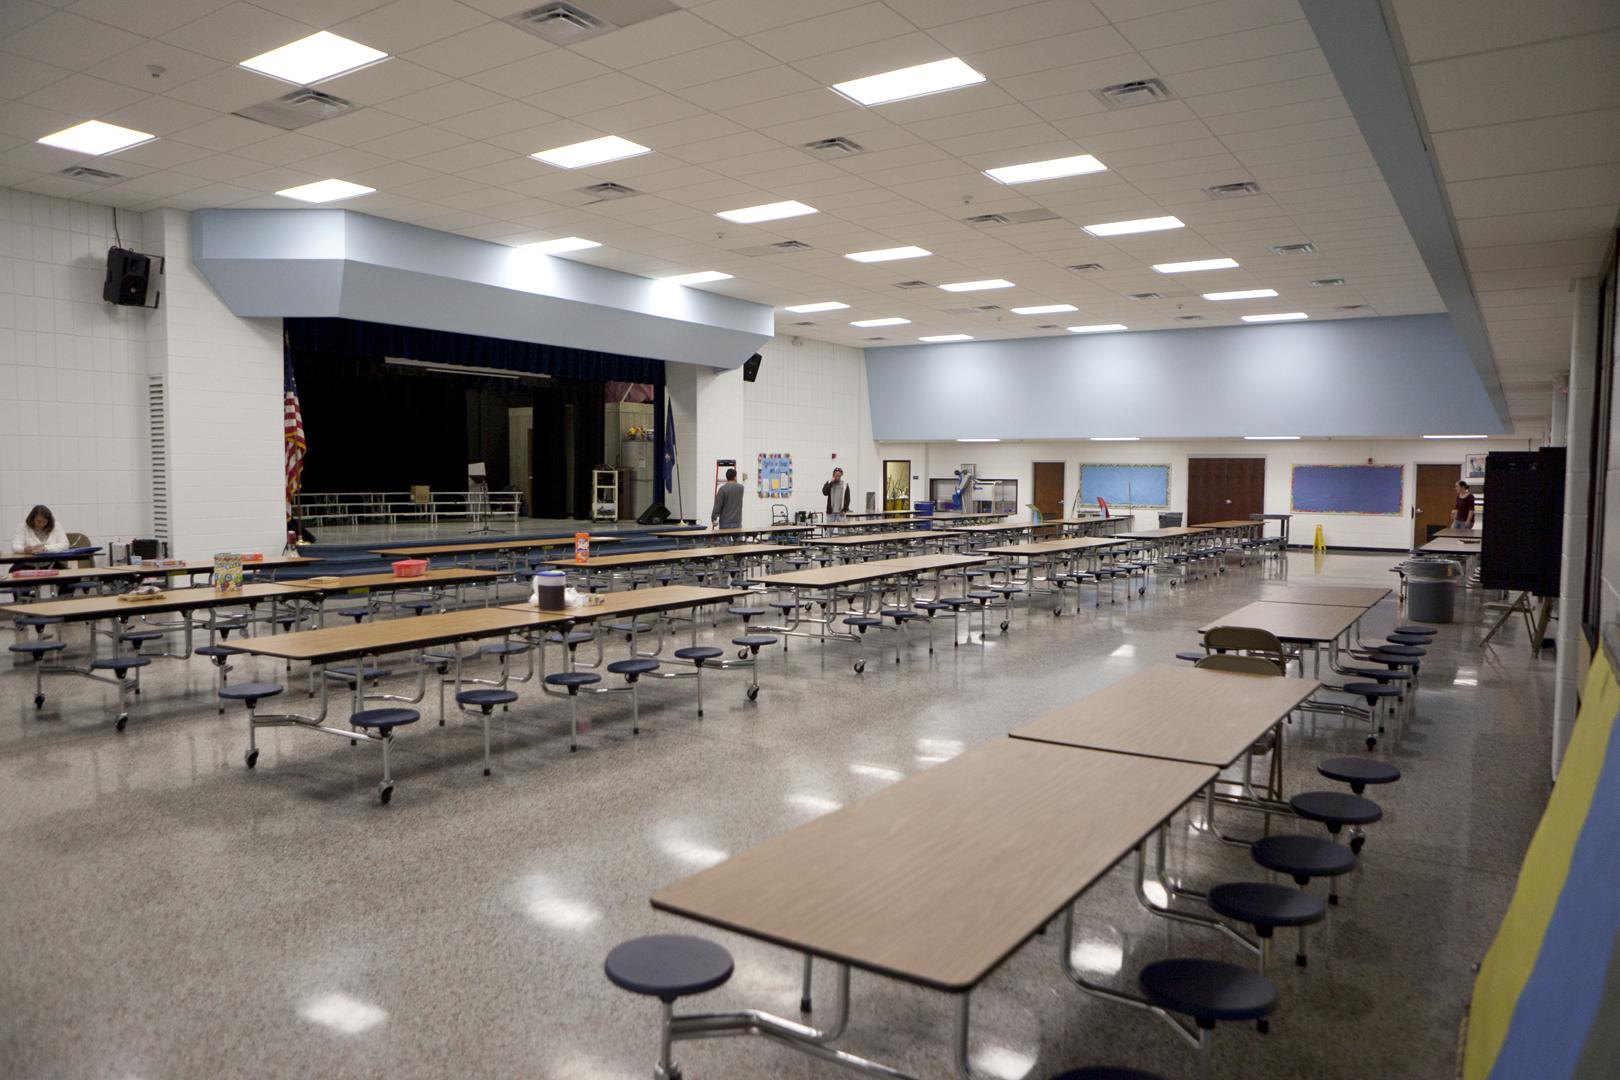 New Kent Elementary School